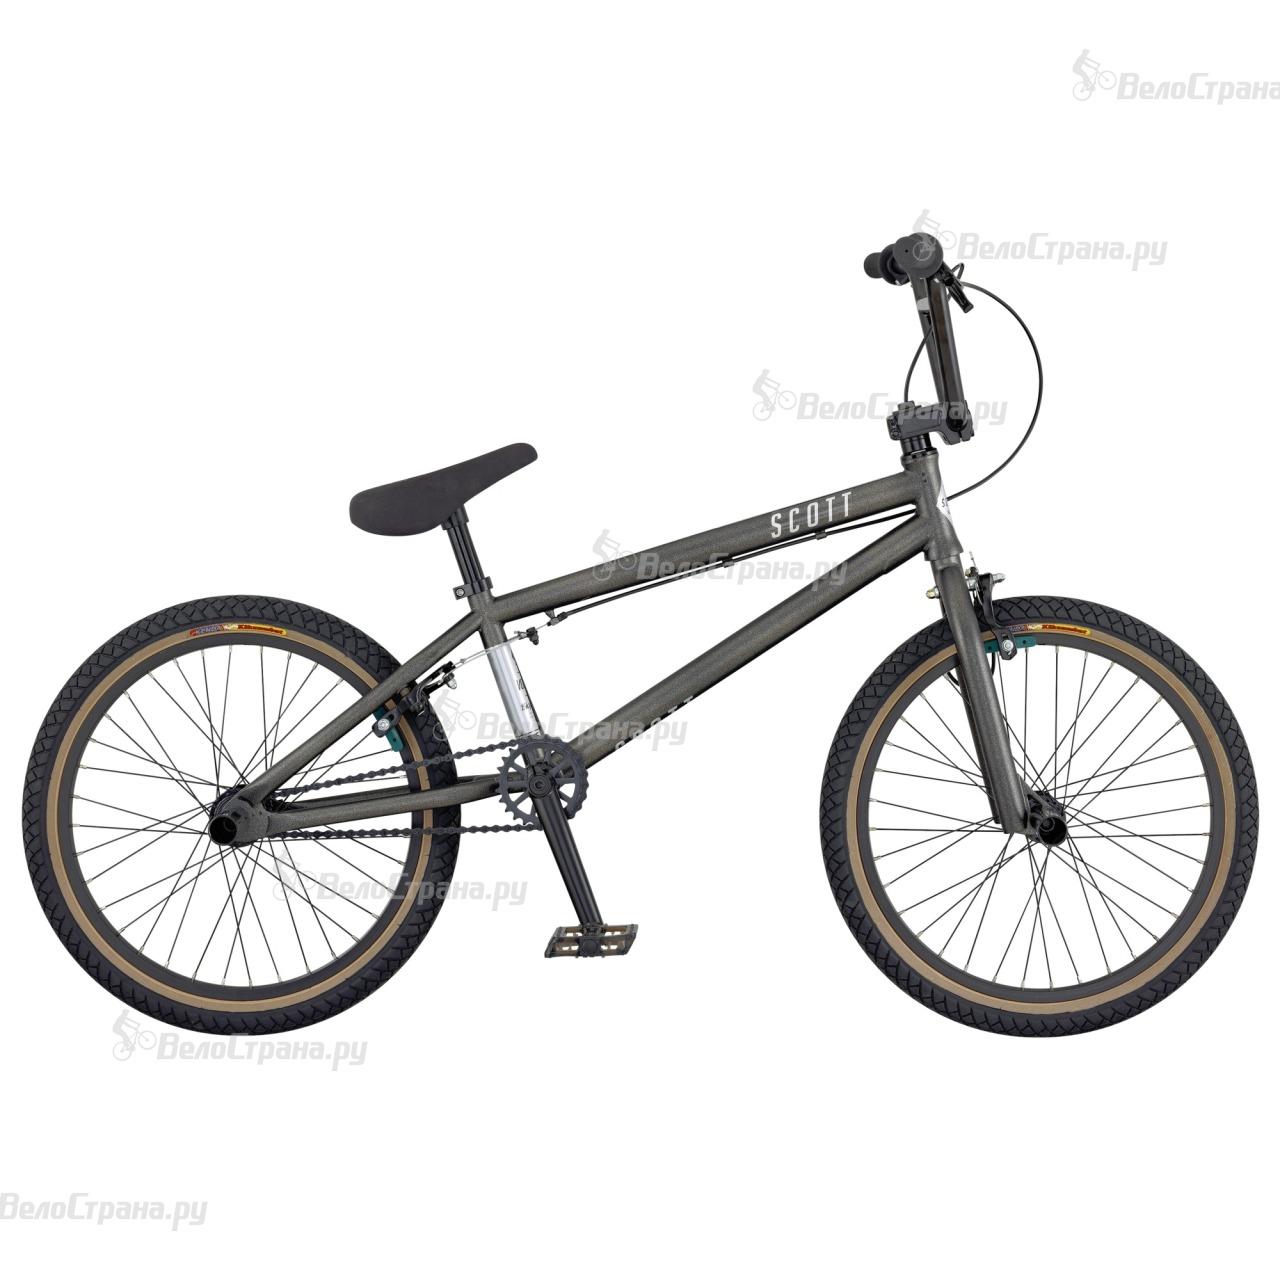 Велосипед Scott Volt-X 10 (2017) маяк findme f2 volt